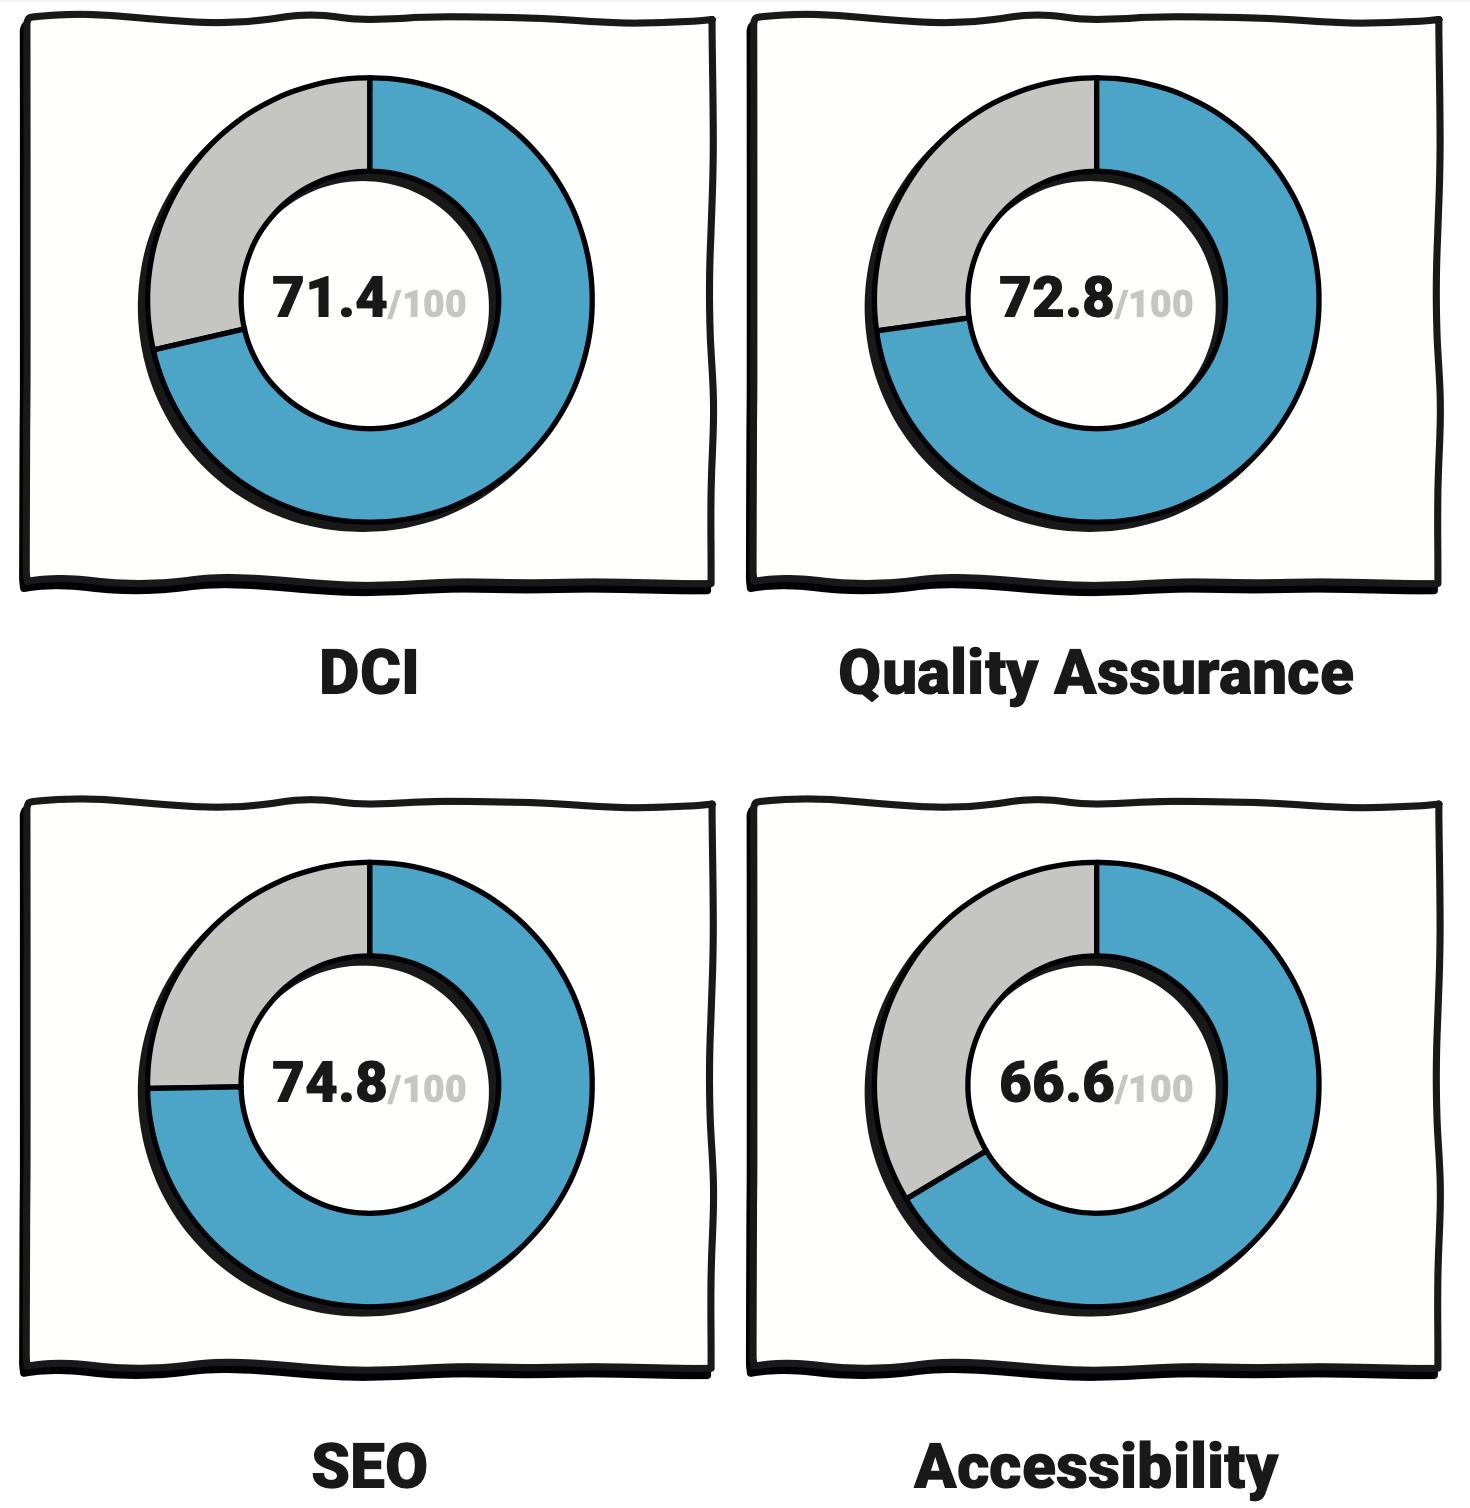 Online Retailers Need to Work on Website Performance: Report